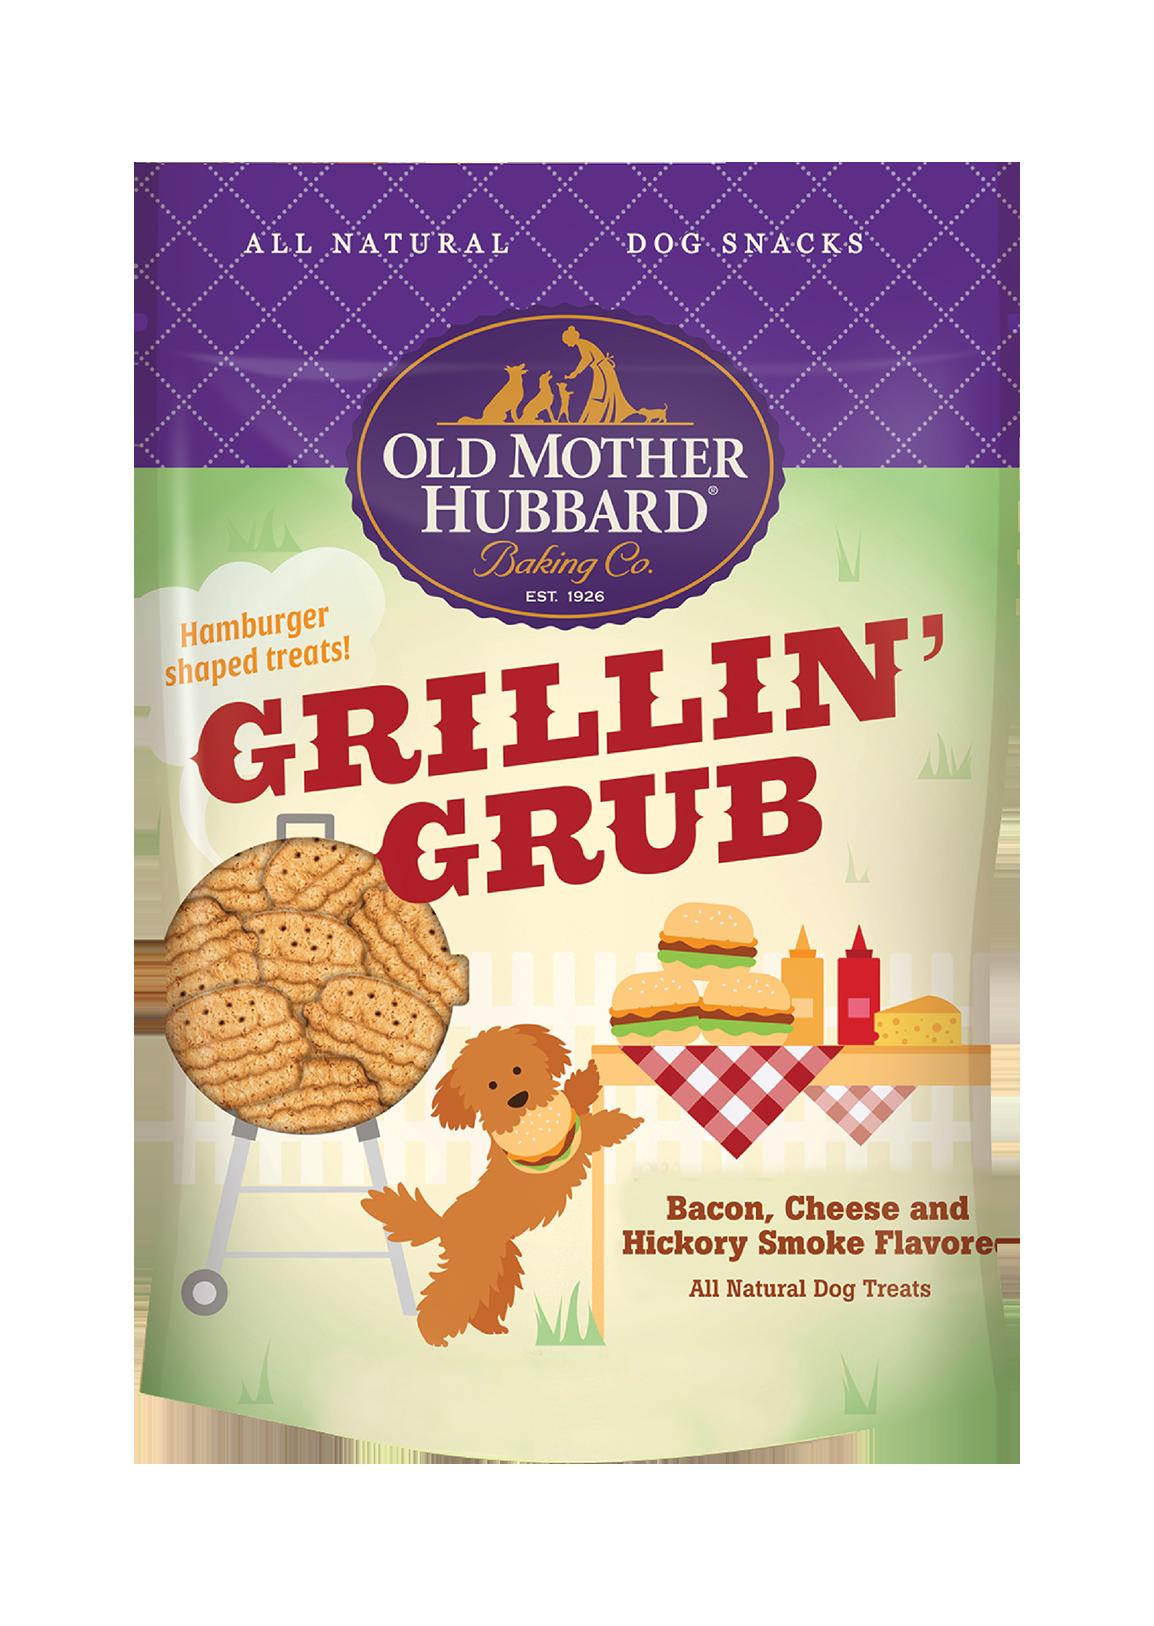 Old Mother Hubbard Grillin' Grub Dog Treats, Large